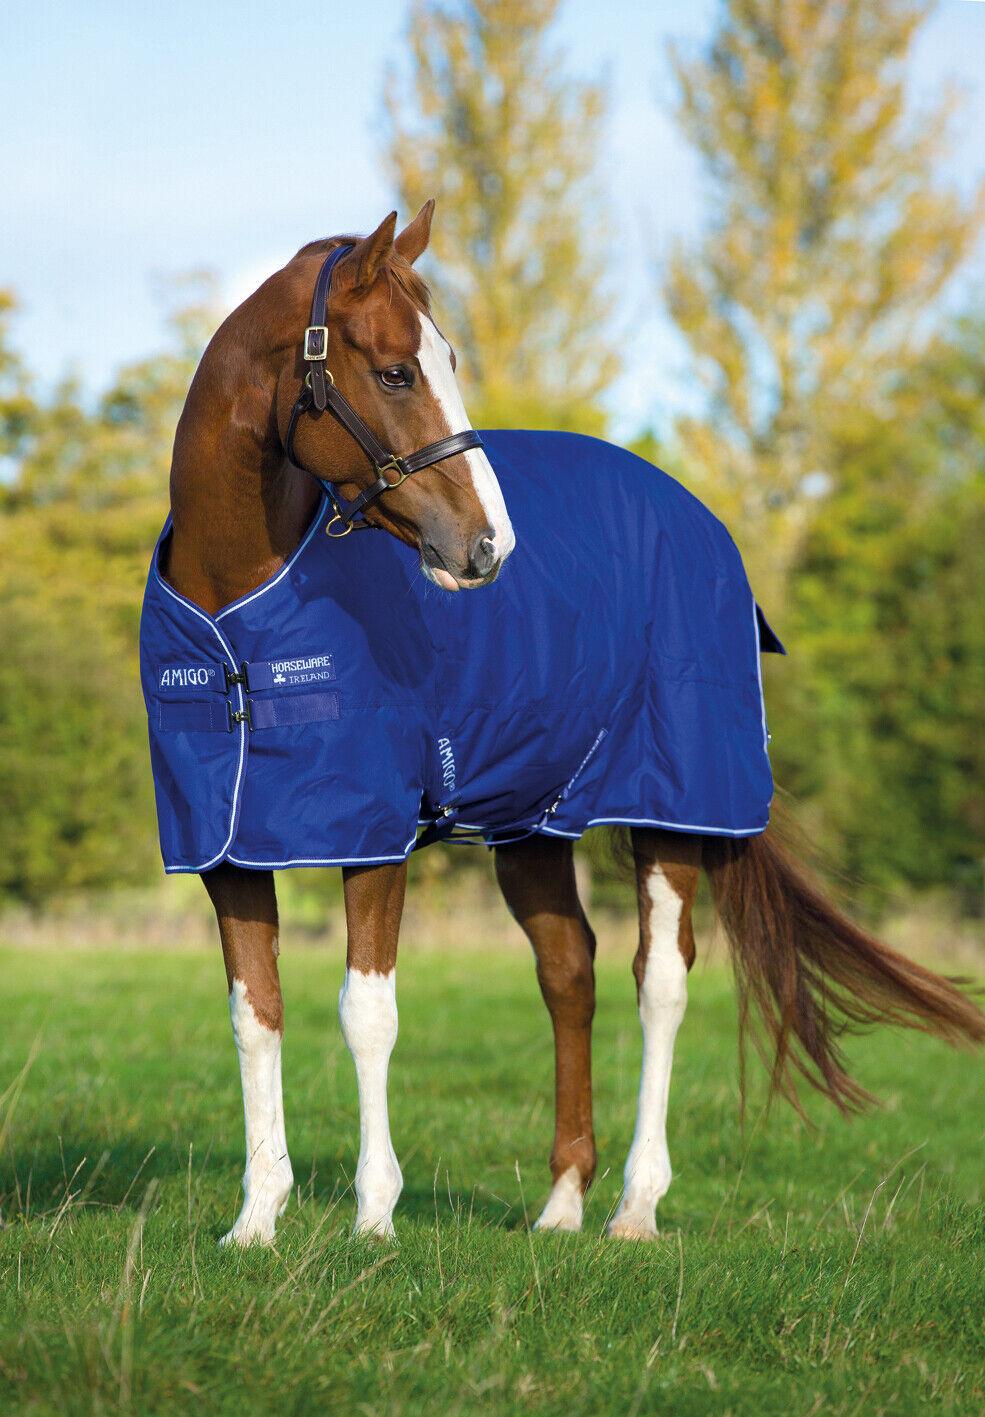 Horseware Amigo HERO 900d TURNOUT Rug Lined Lightweight Lite 0g Blau 5'6 -7'0